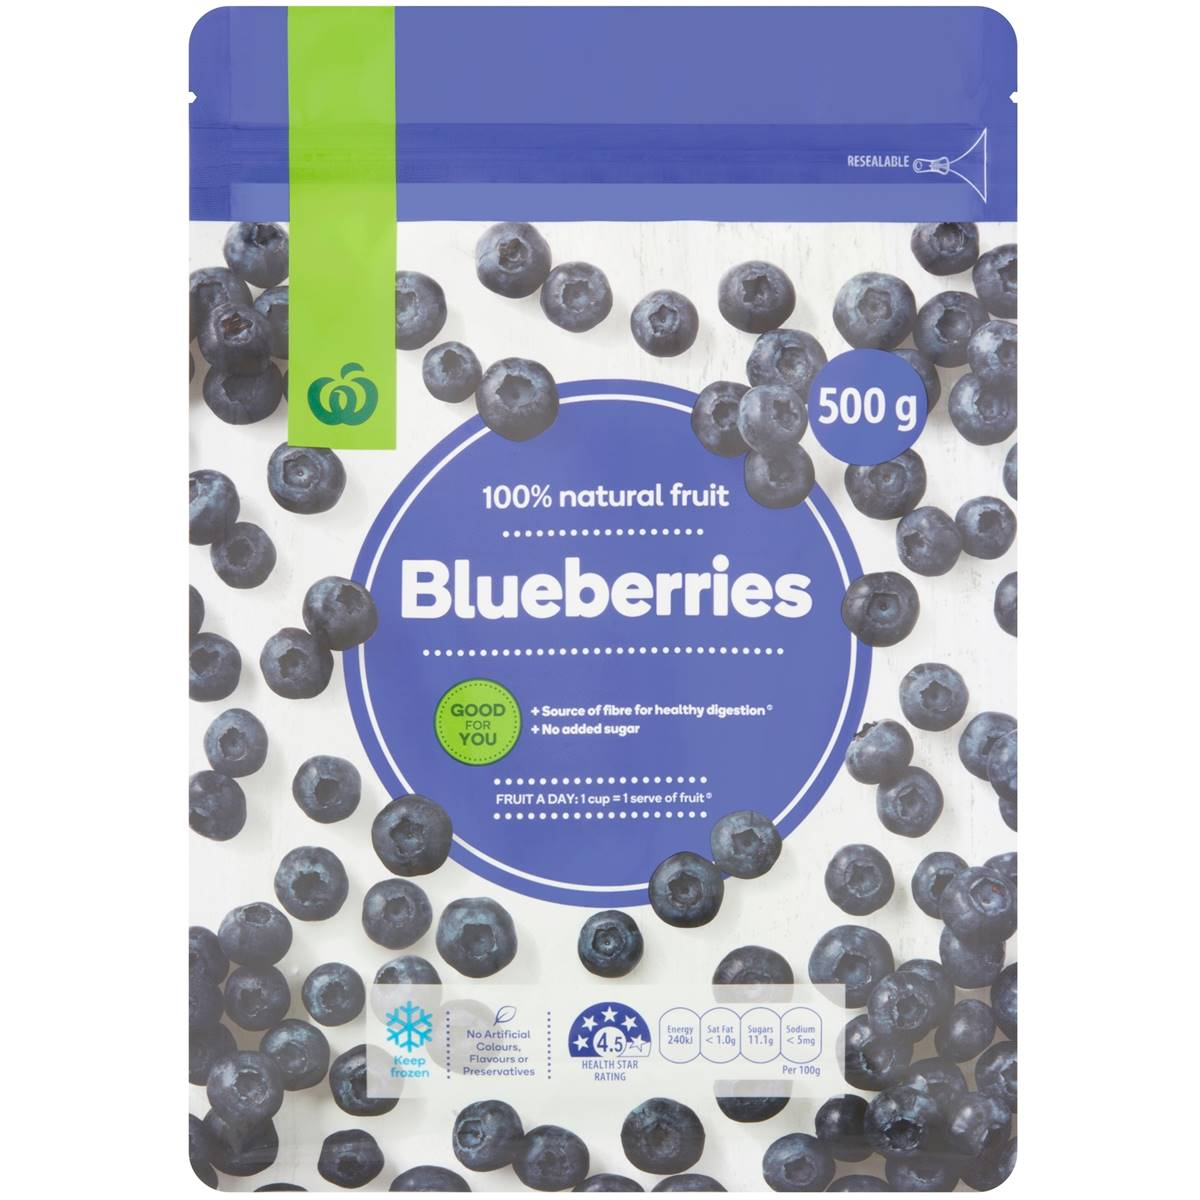 Woolworths Frozen Blueberries